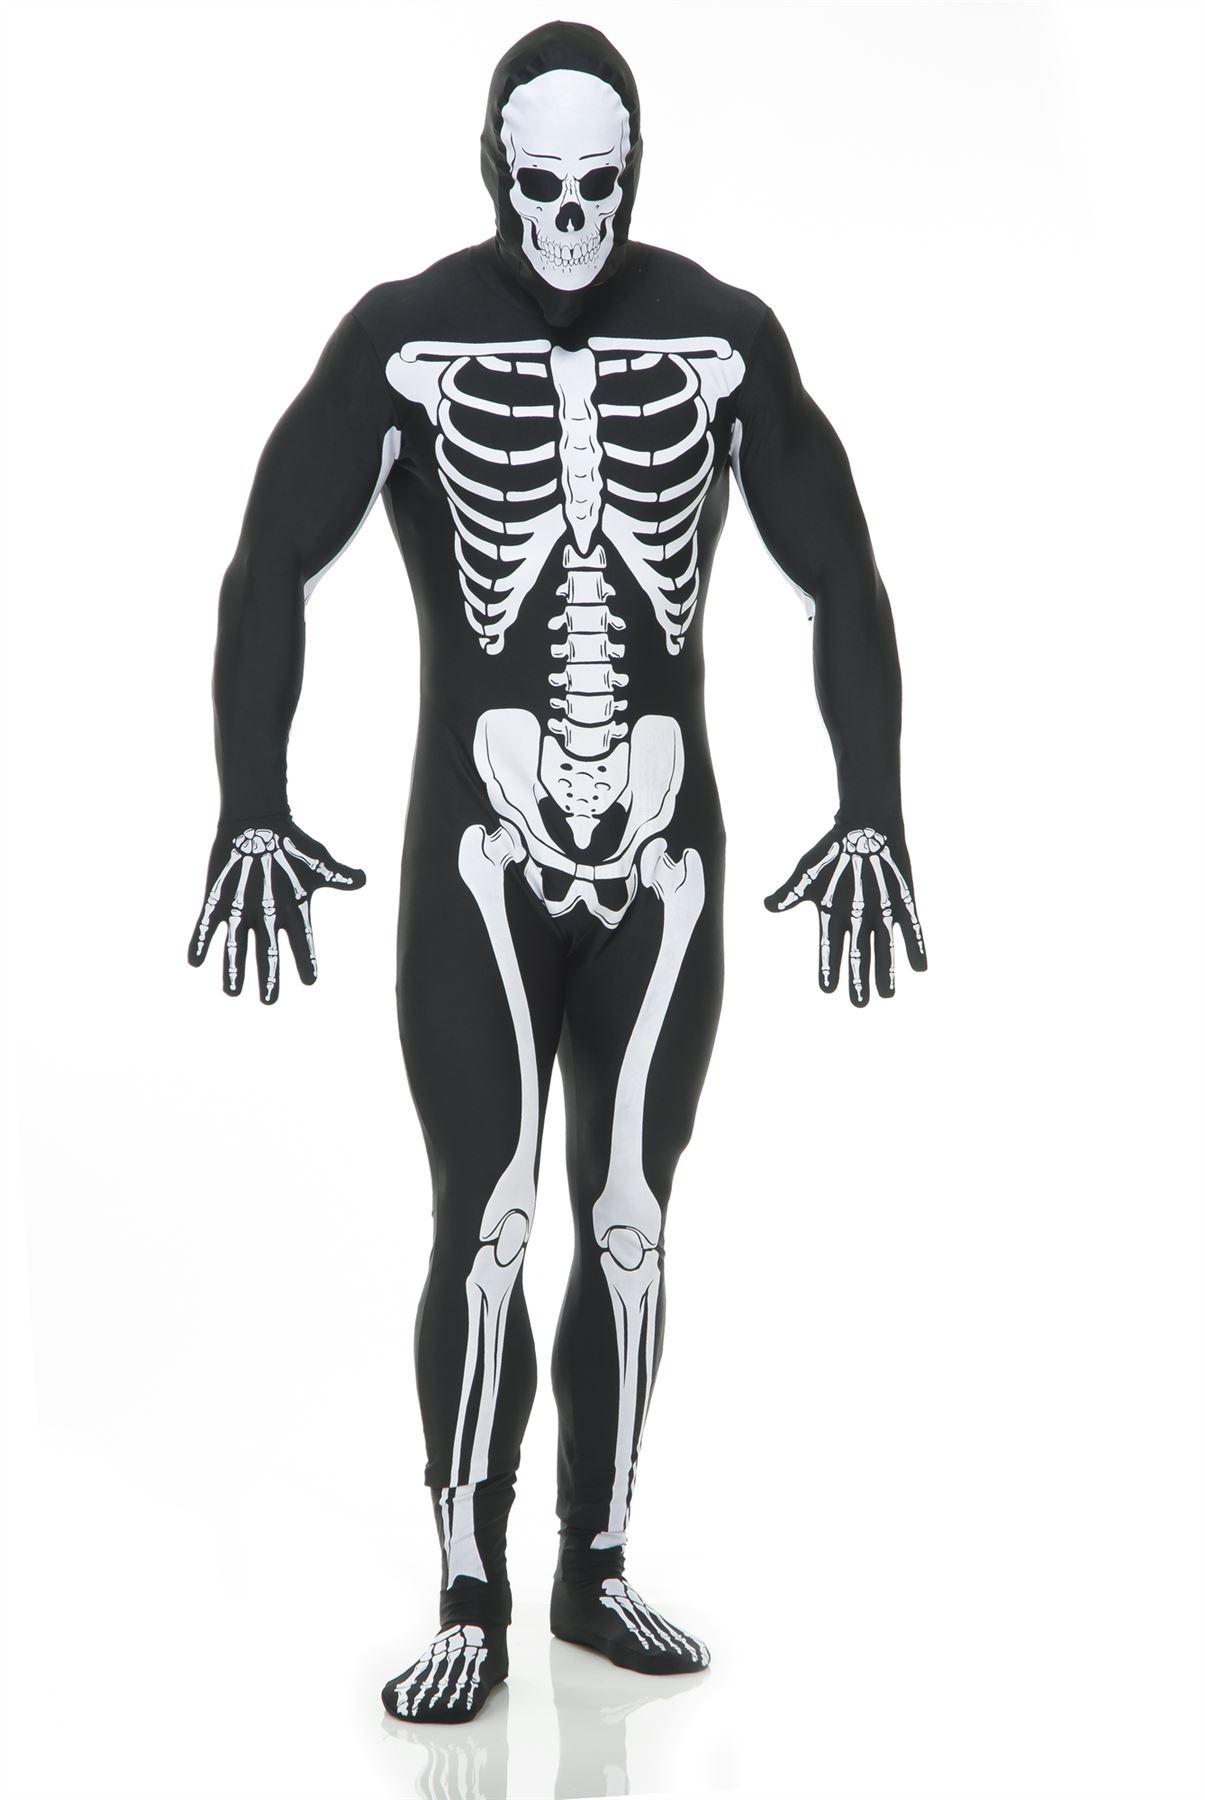 Adult Scary Skeleton Bodysuit Halloween Costume | eBay